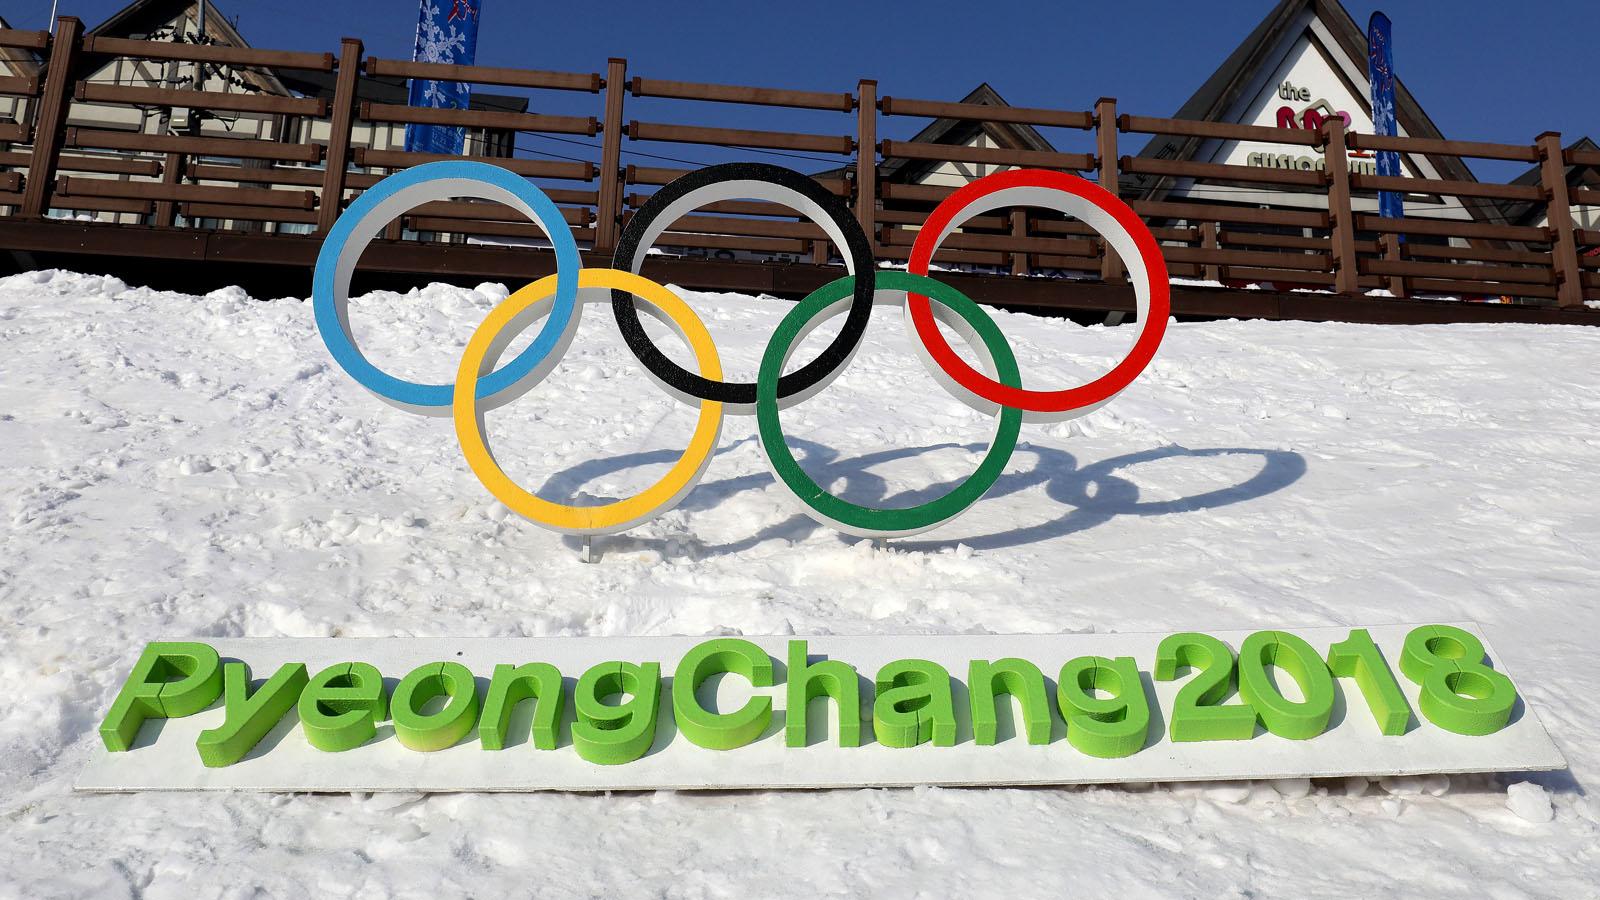 Nikki-Haley-casts-doubt-on-U.S.-athletes-at-2018-Olympics